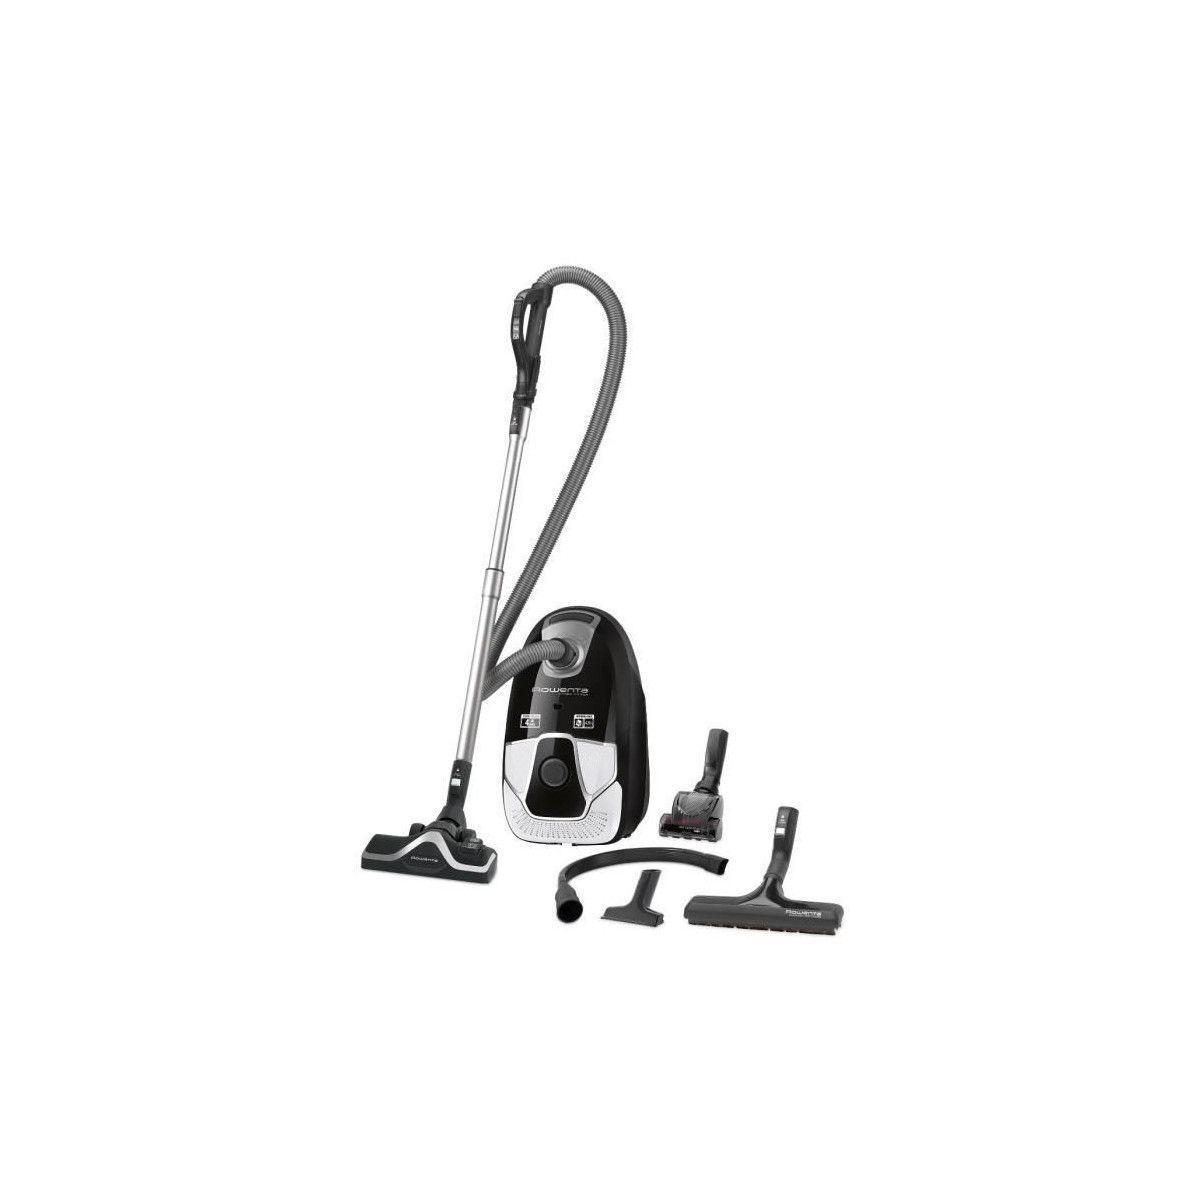 Rowenta Aspirateur avec sac X-trem Power CAR PRO - RO6887EA - Noir/Blanc